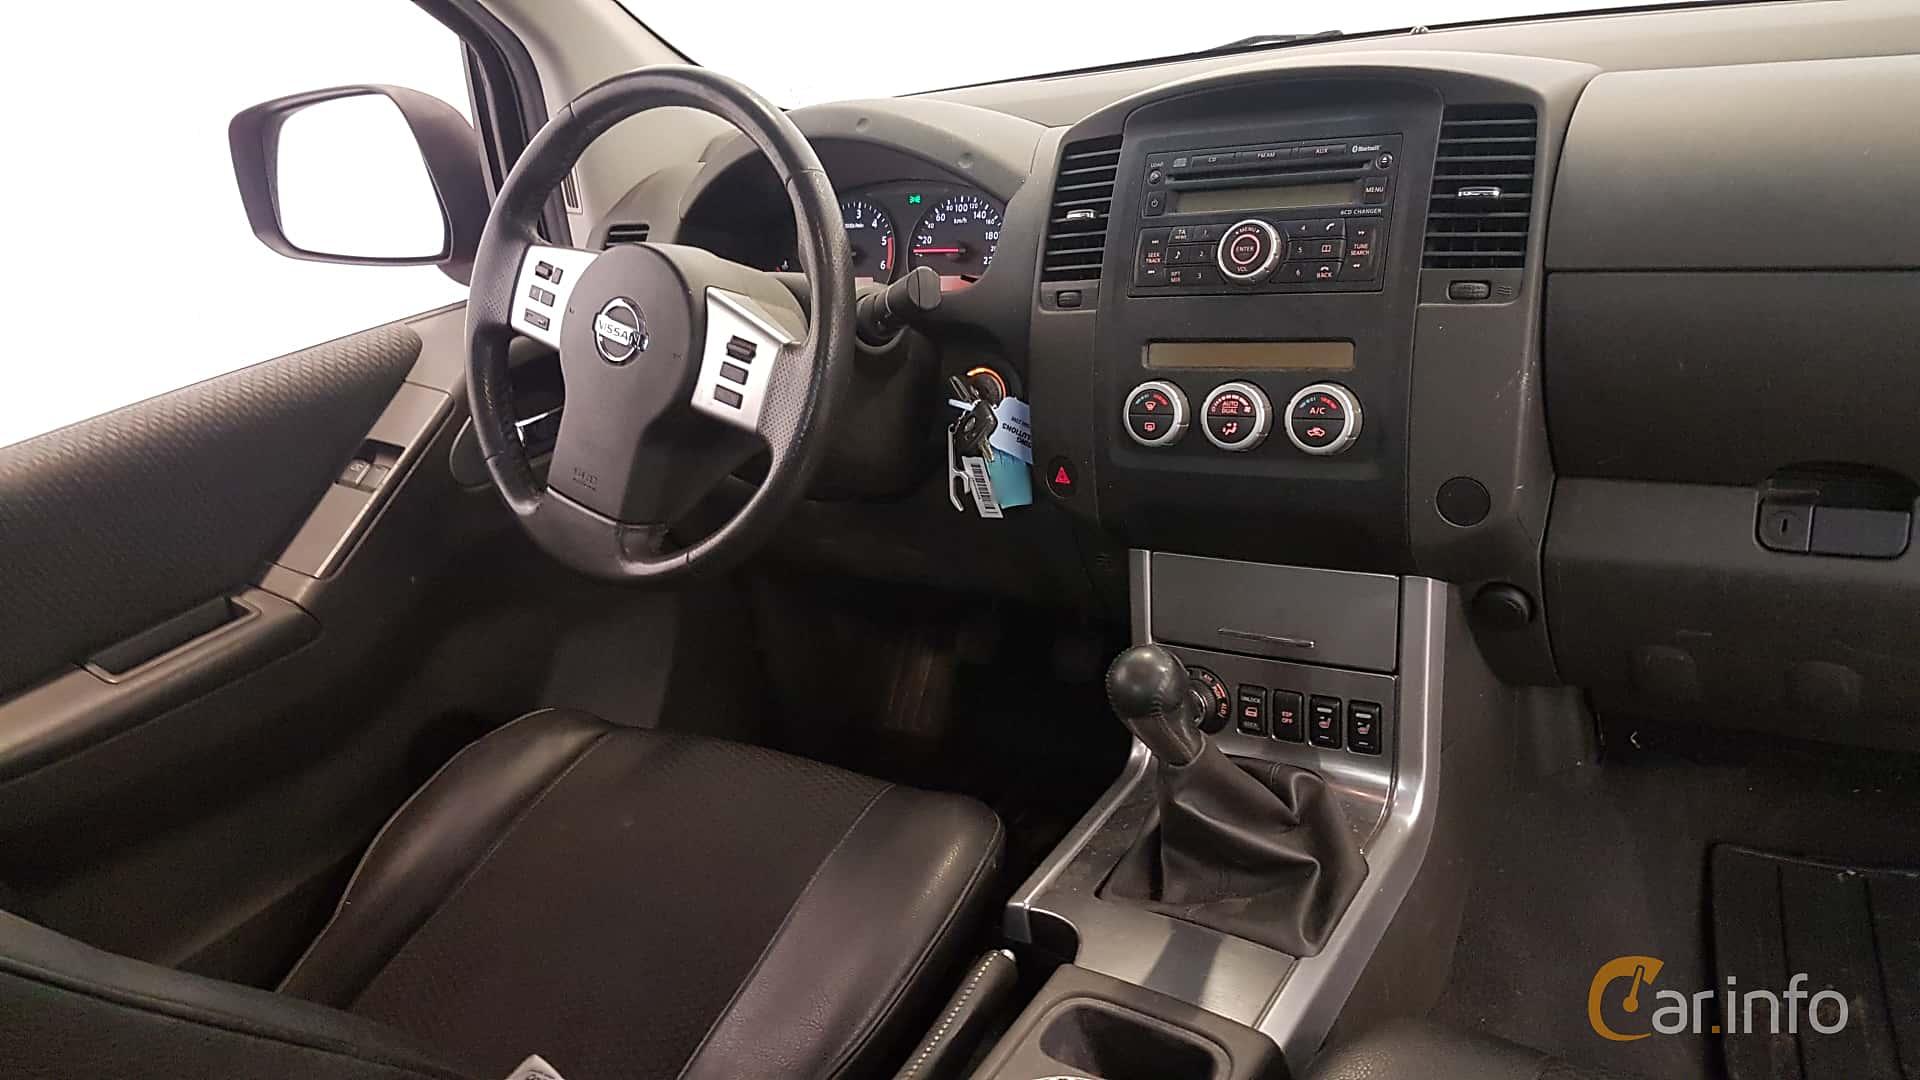 Nissan Navara King Cab 2.5 dCi 4x4 Manuell, 190hk, 2011